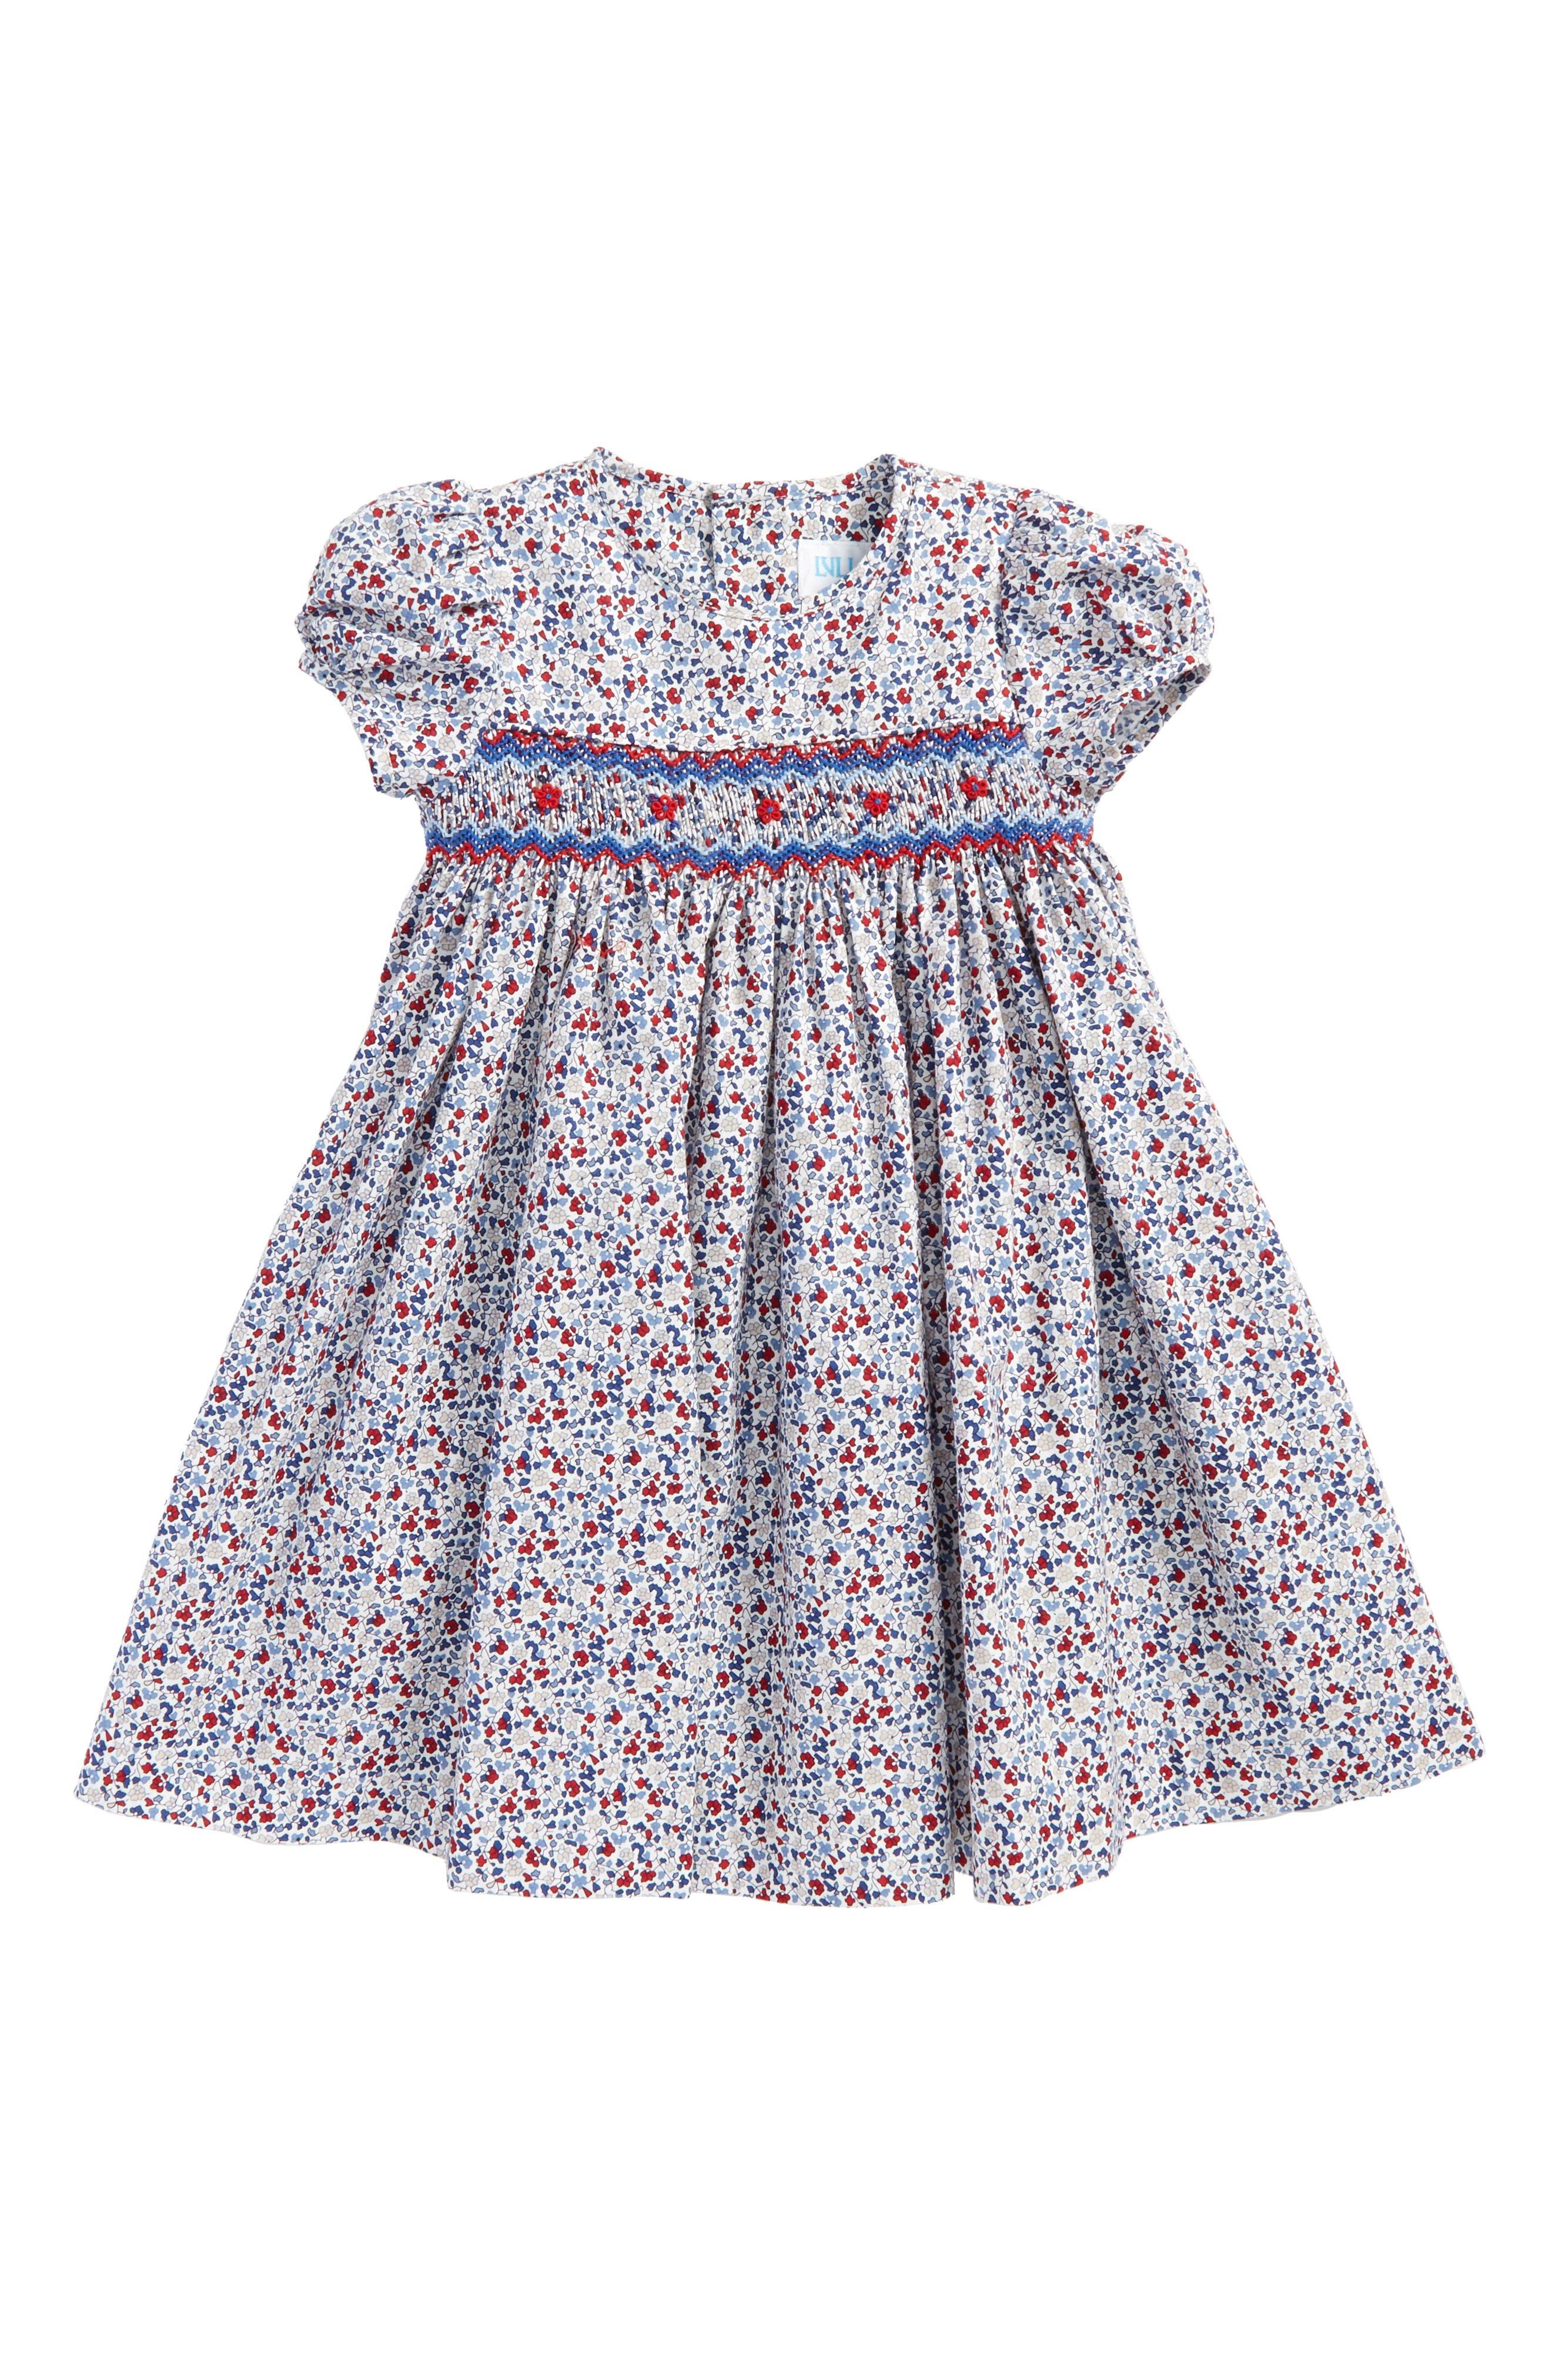 Main Image - Luli & Me Floral Smocked Dress (Baby Girls)